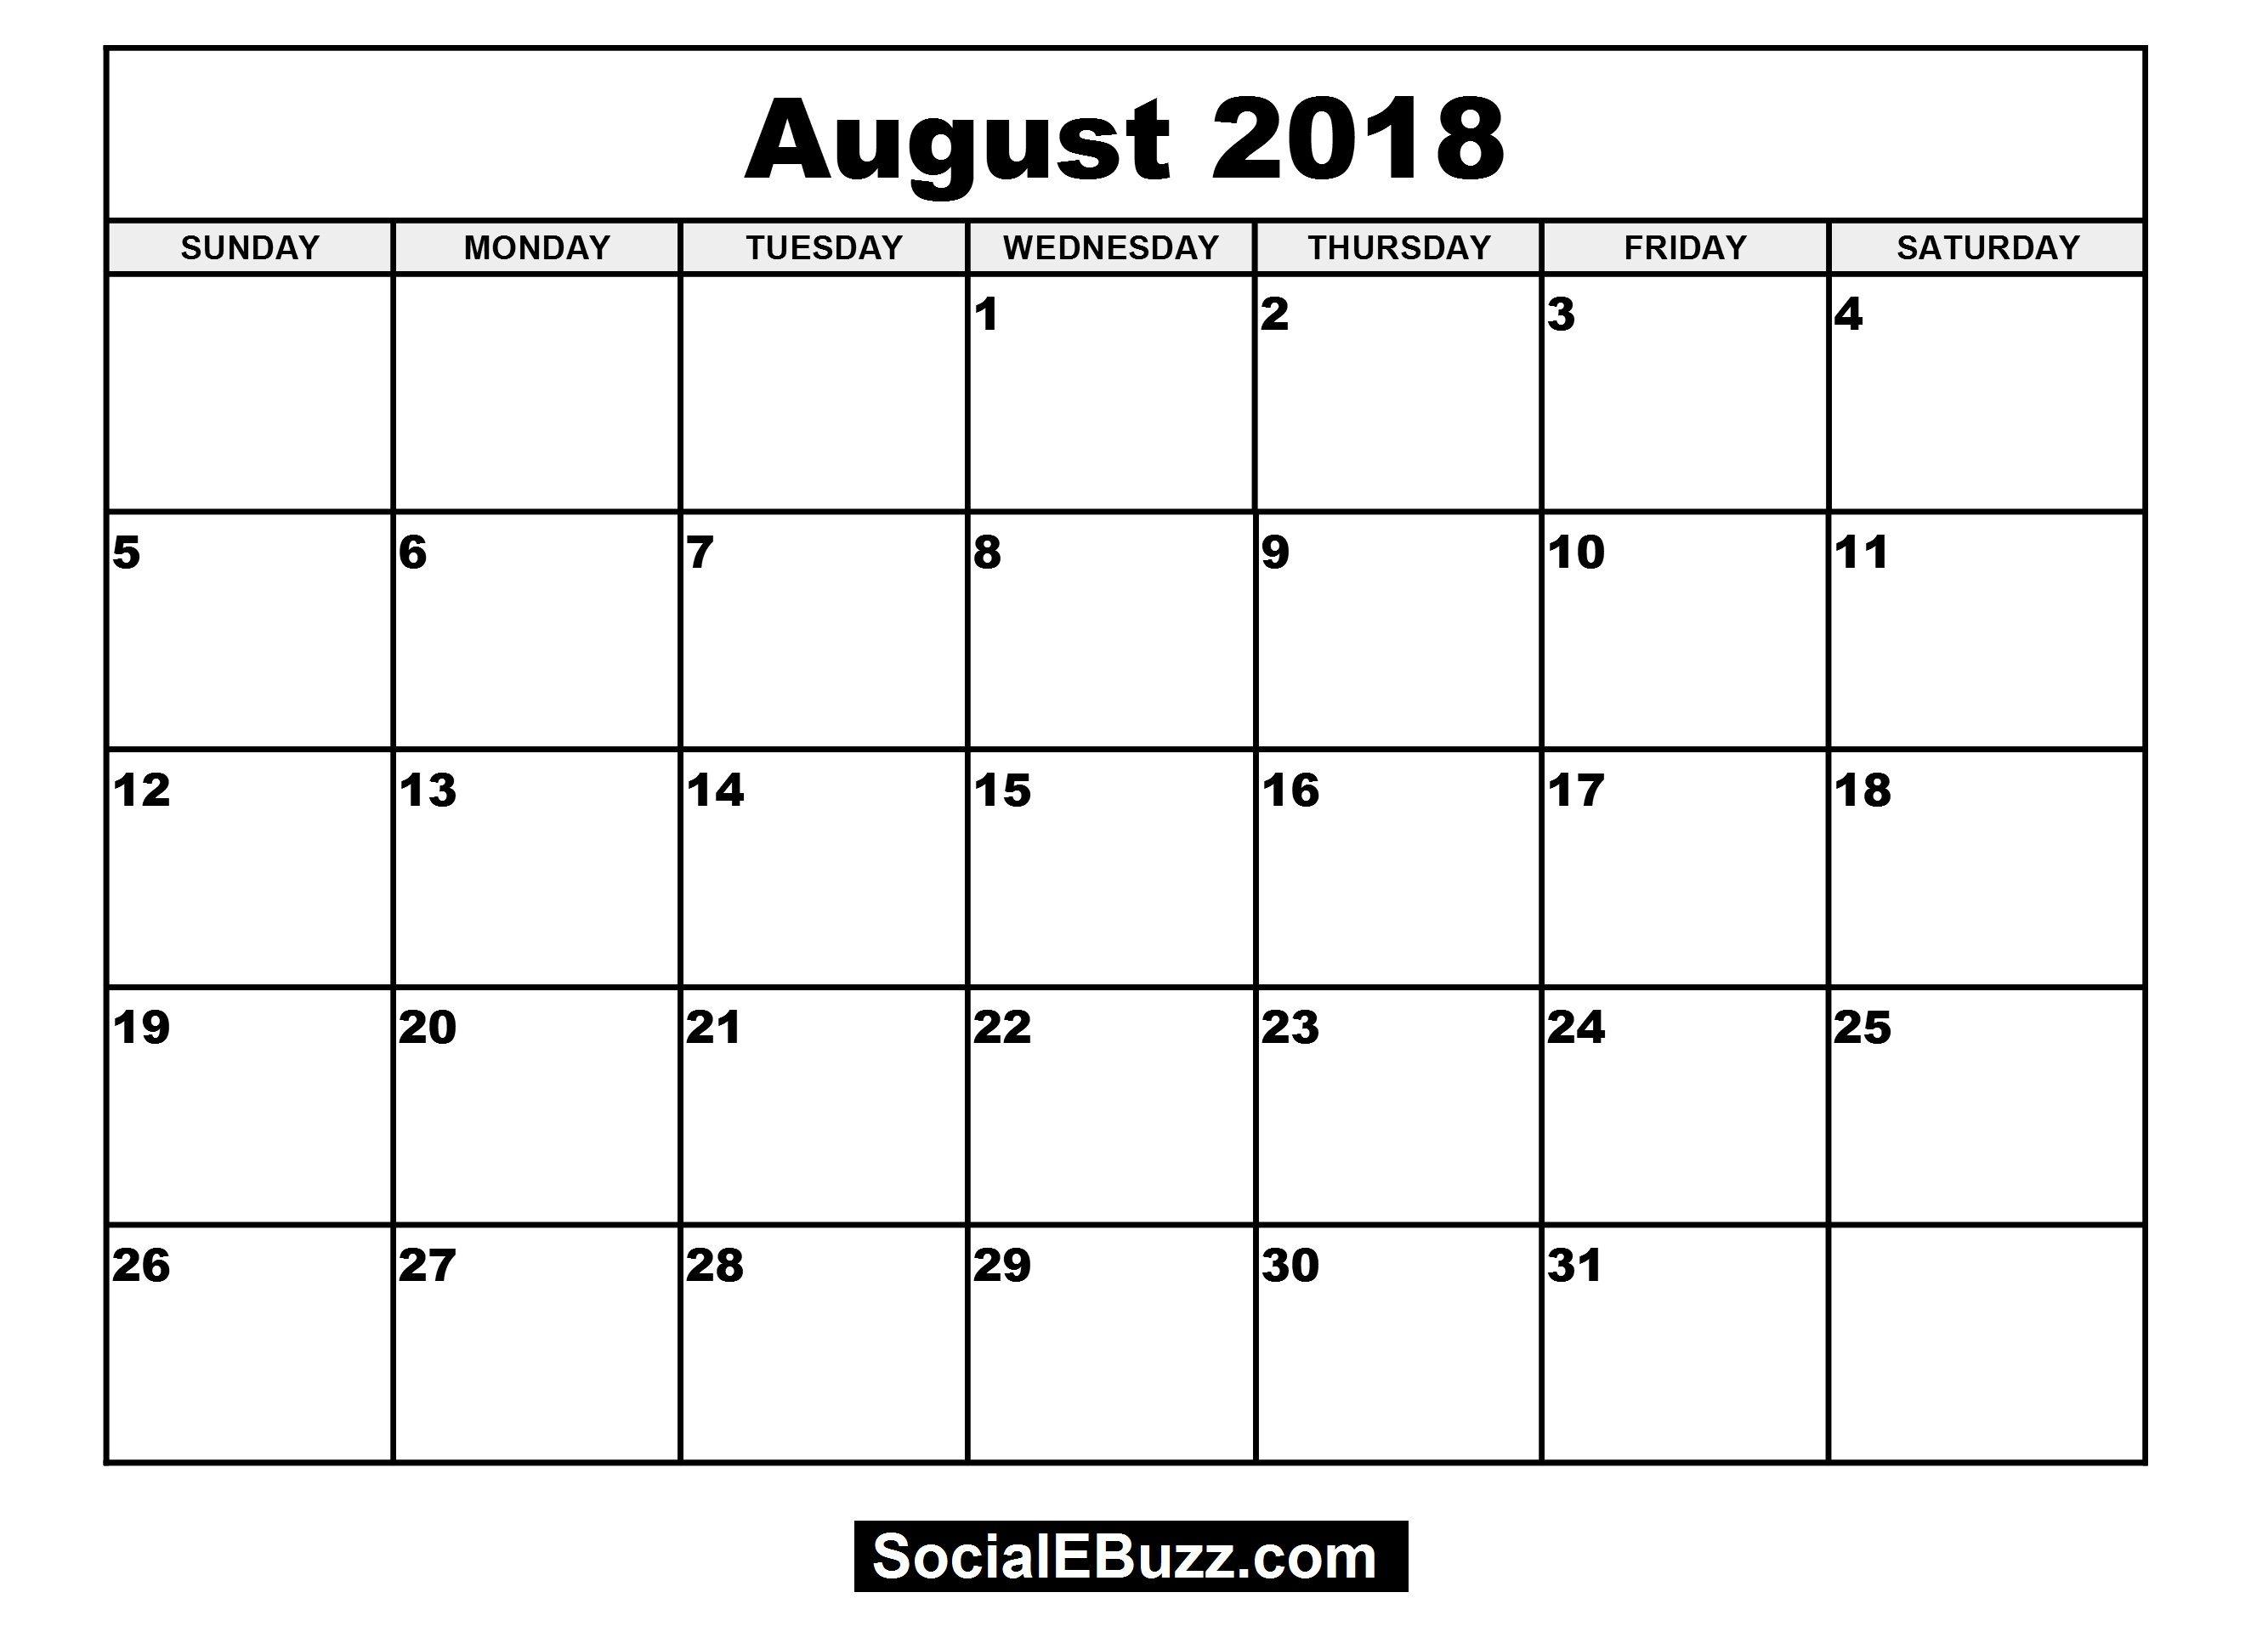 Pincalendar Printable On August 2018 Calendar | 2018 Calendar within August - December Blank Calendar